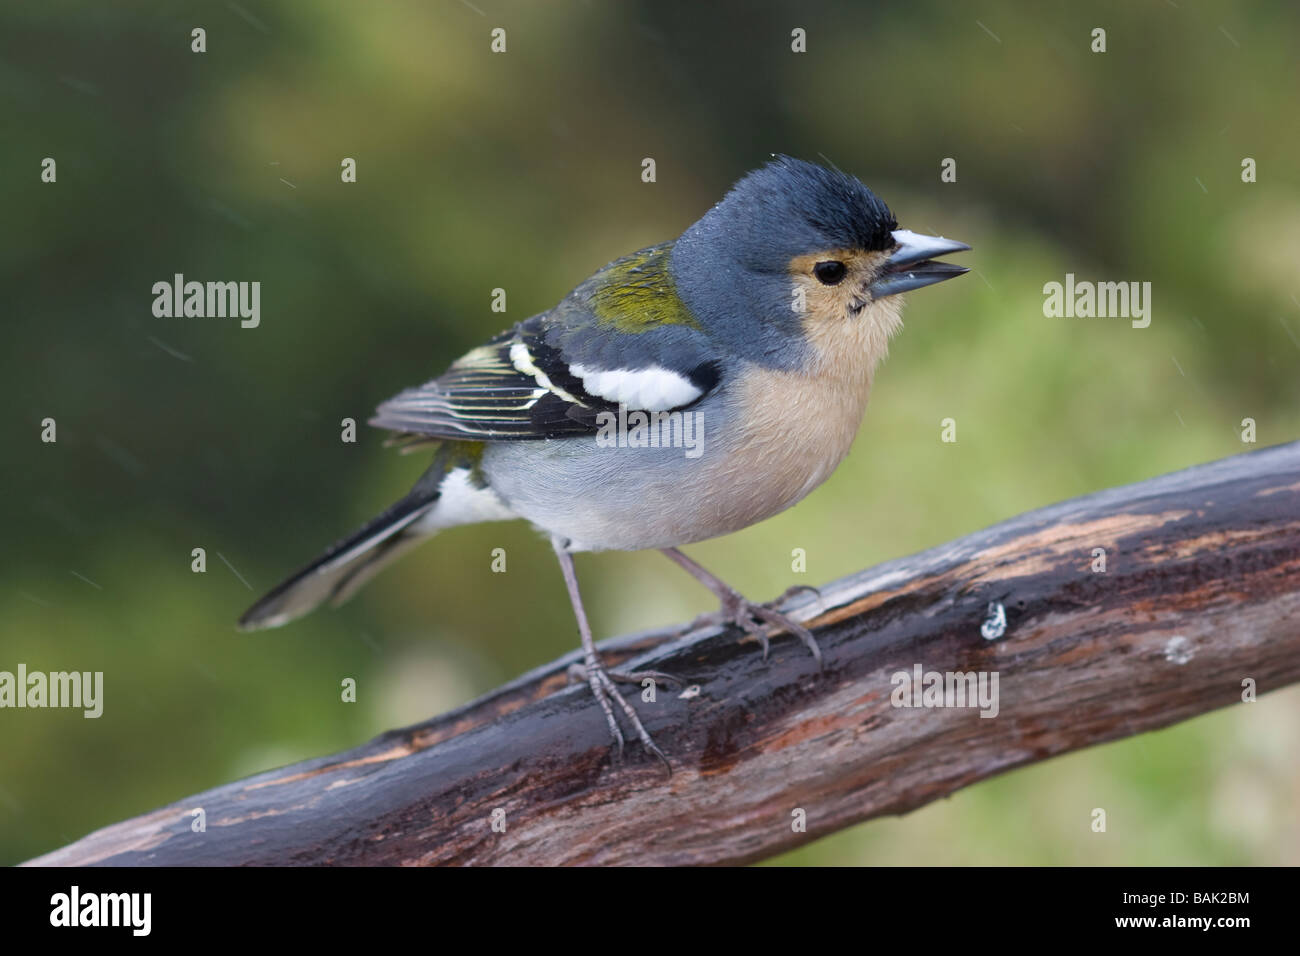 Madeiran Chaffinch Fringilla madeirensis - Stock Image